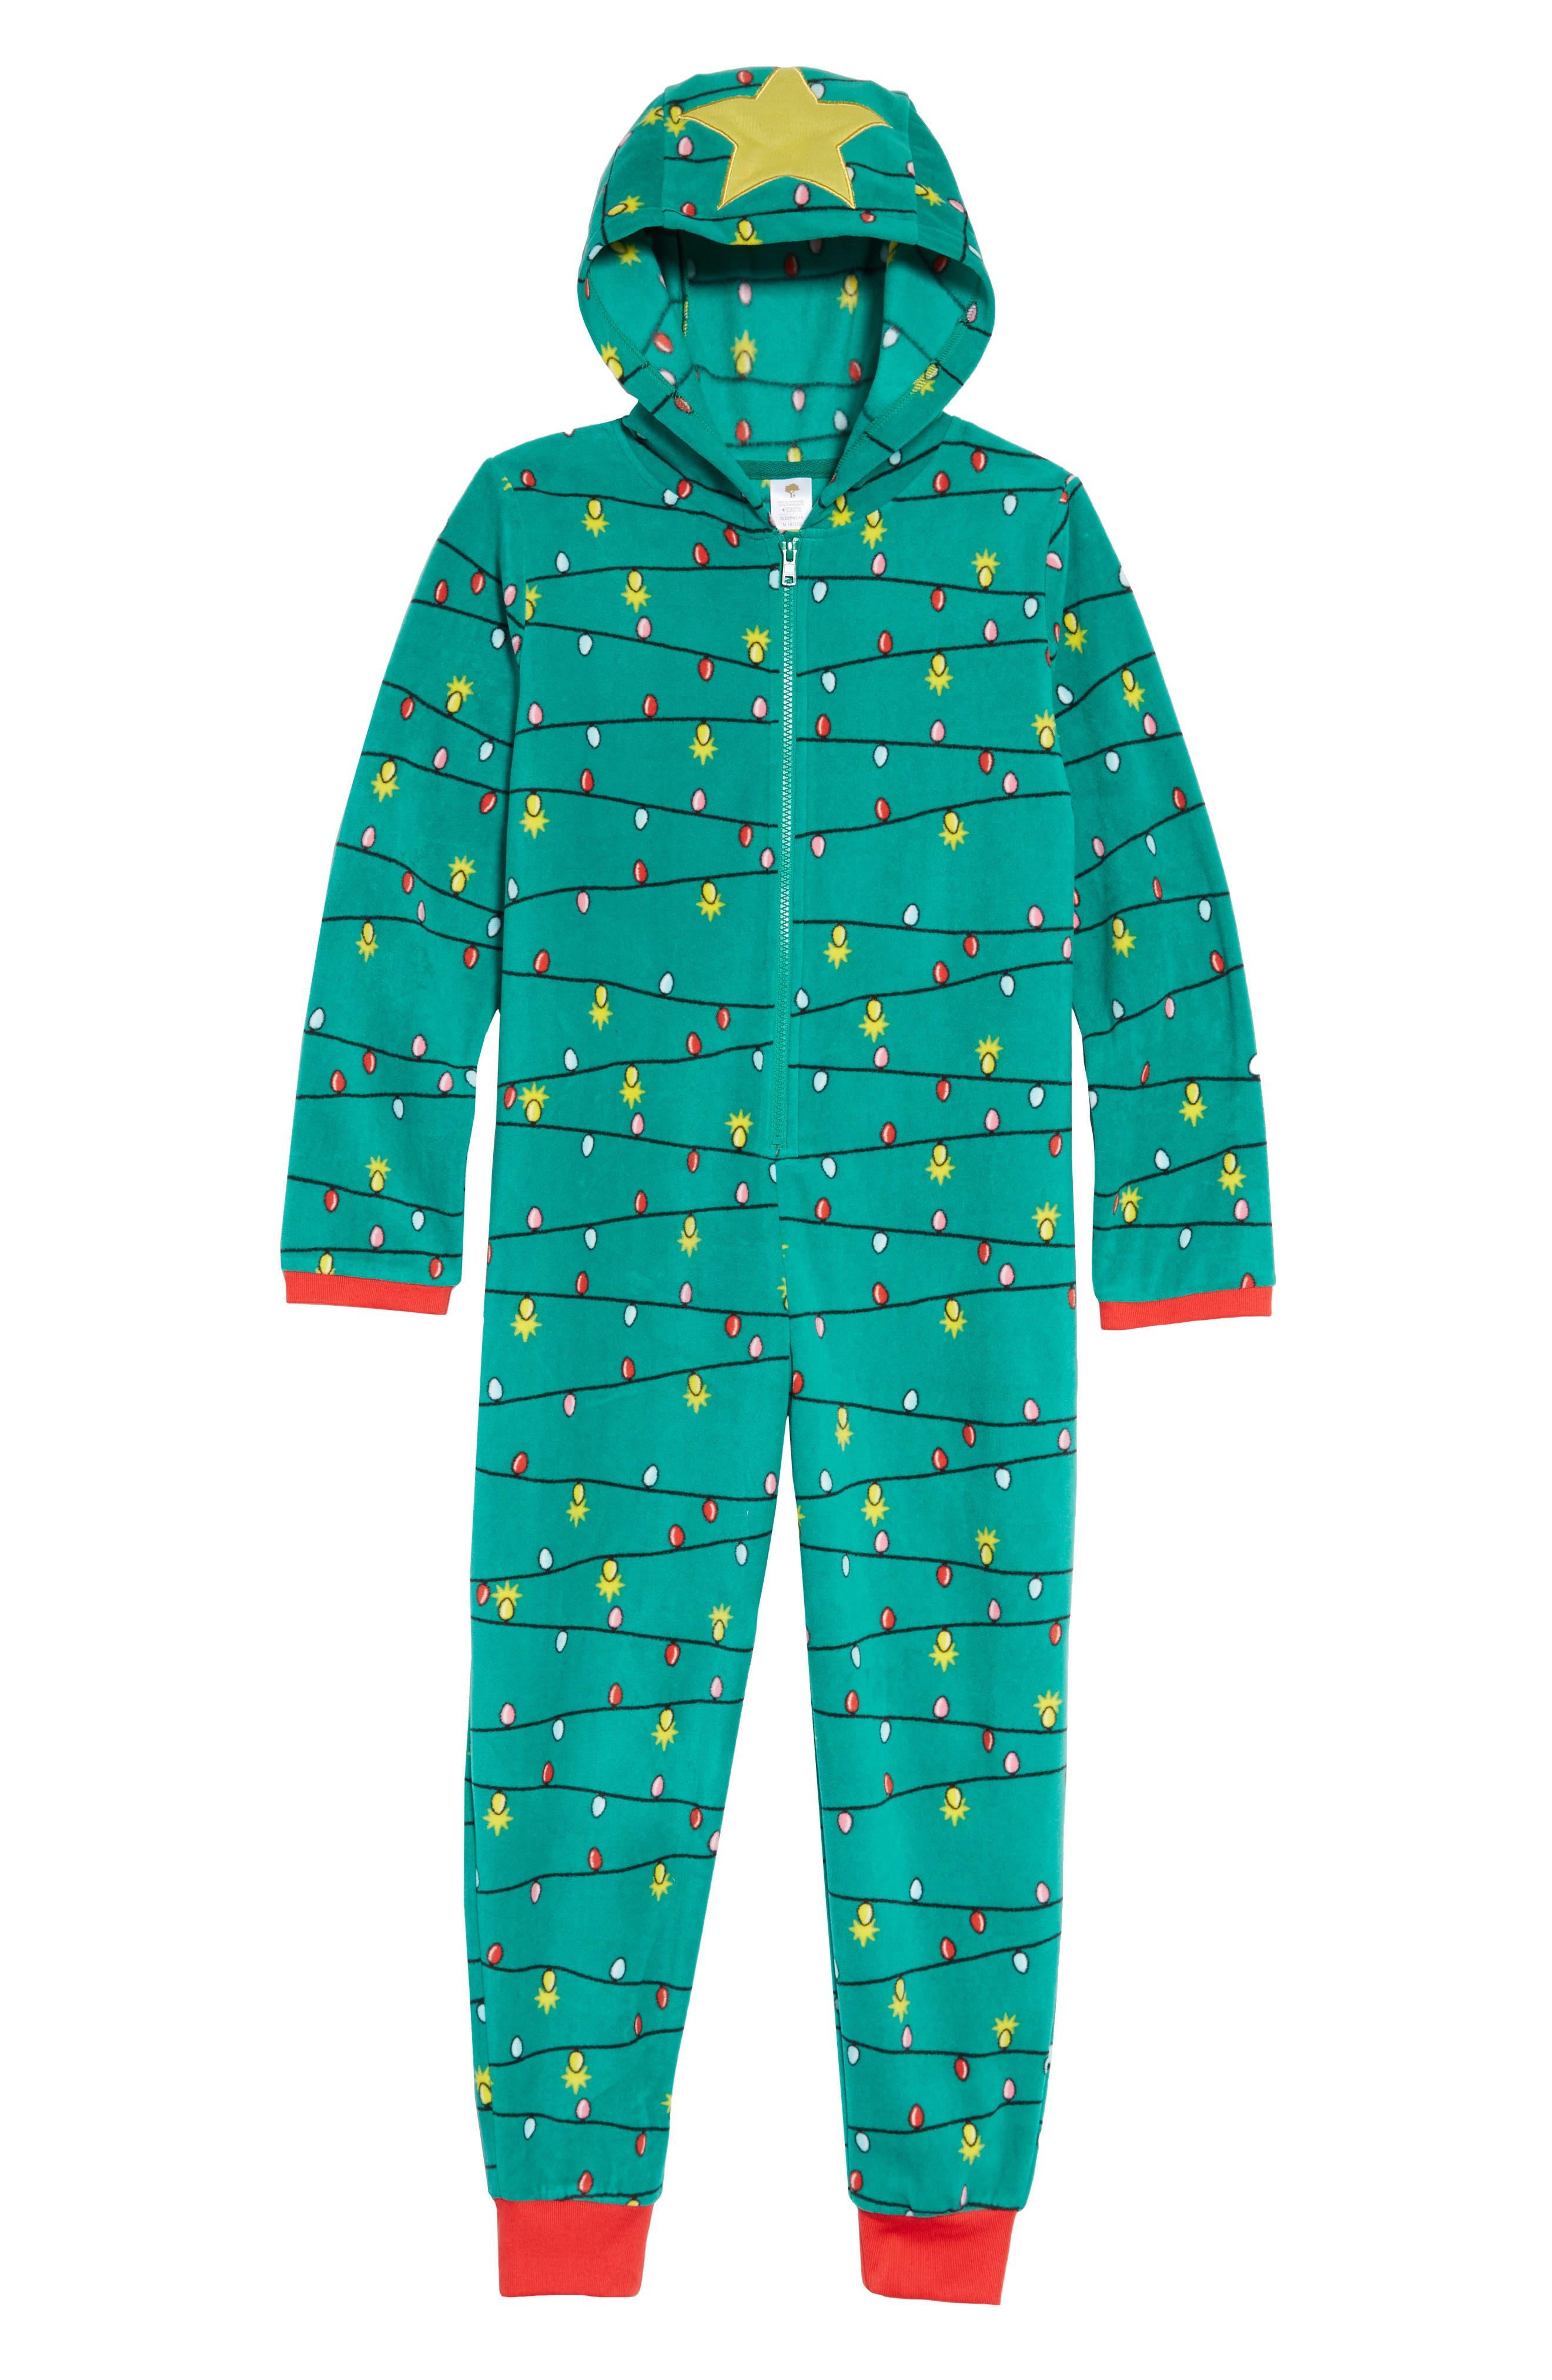 One Piece Fleece Bodysuit,                         Main,                         color, GREEN GENIUS CHRISTMAS TREE